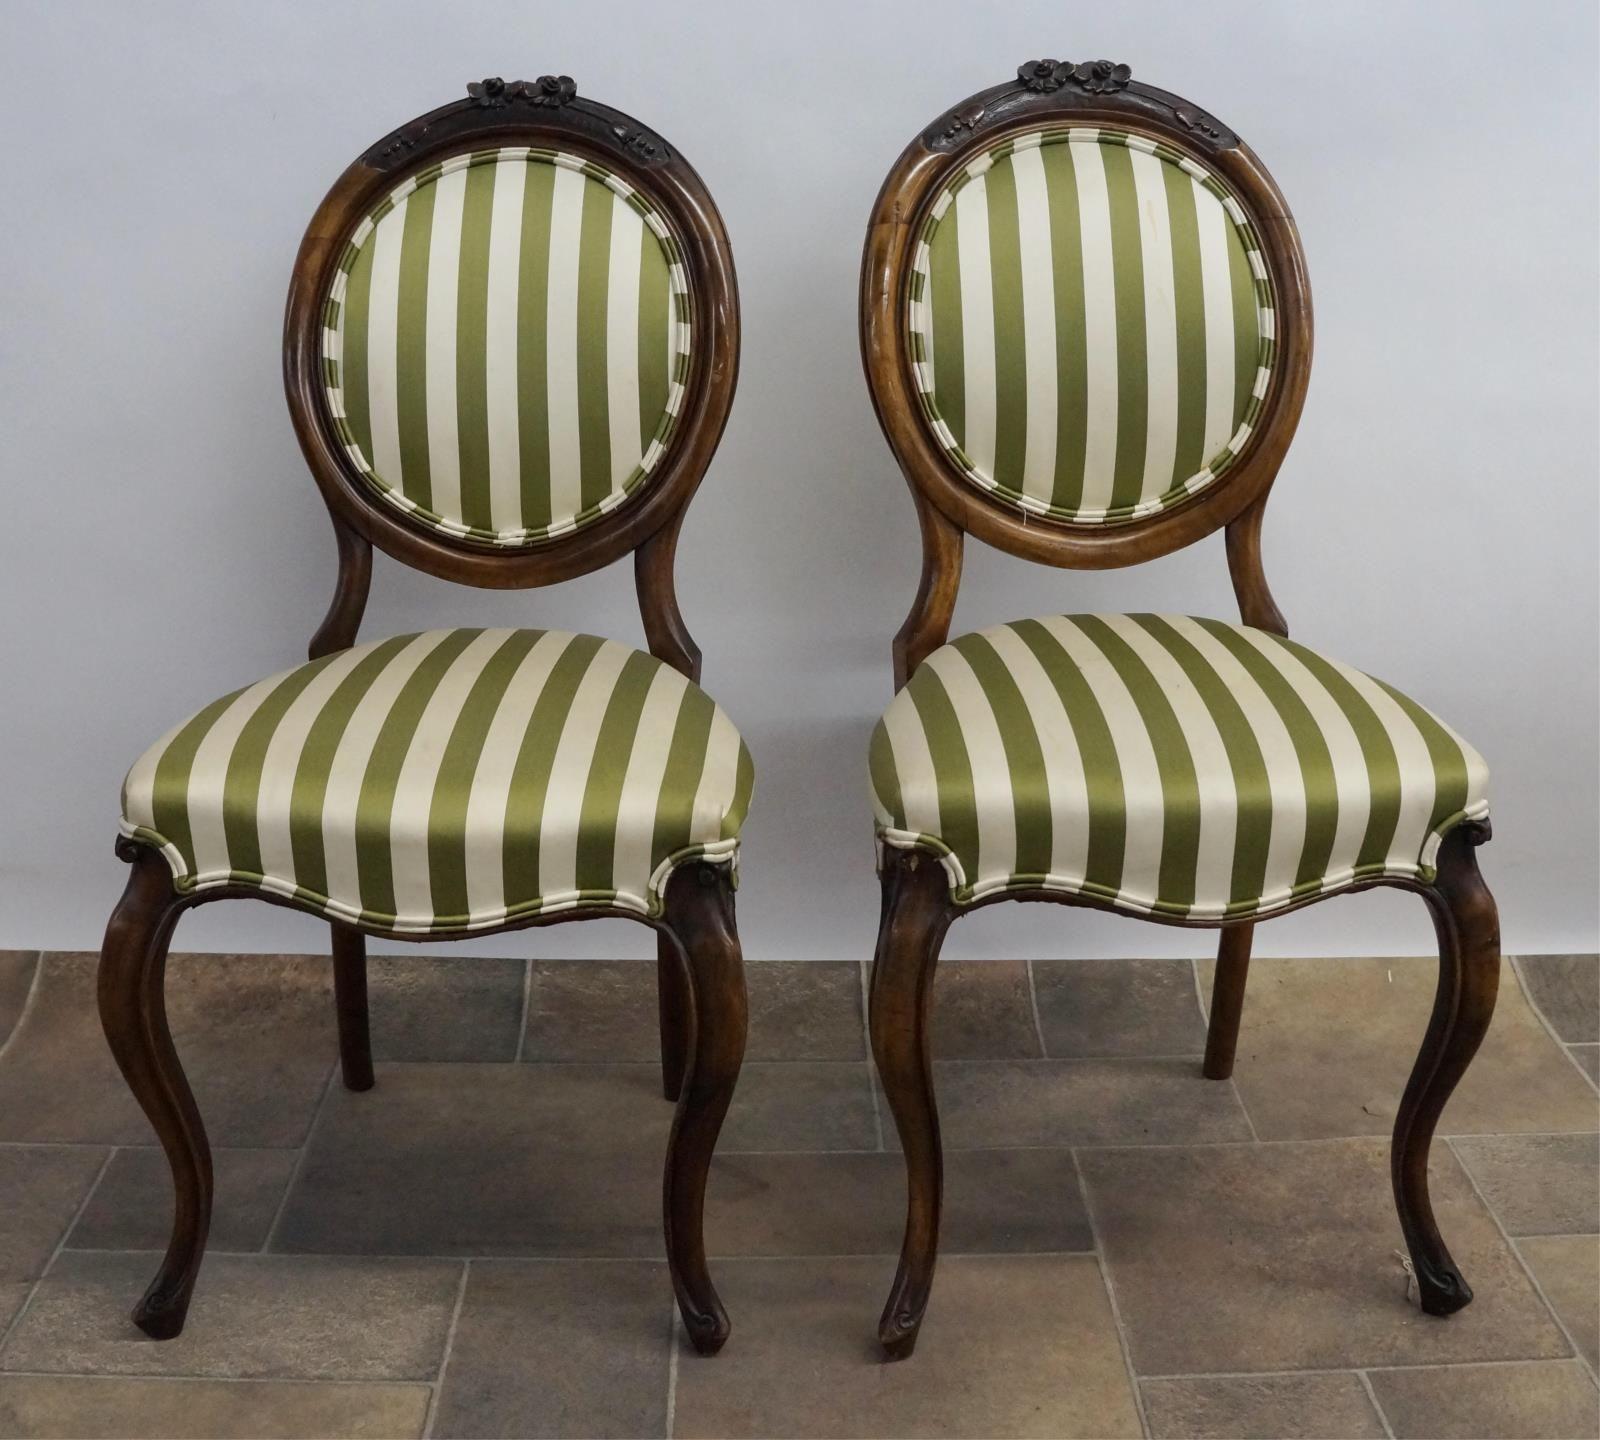 Lot 21 Victorian Mahogany Balloon Back Chairs 2